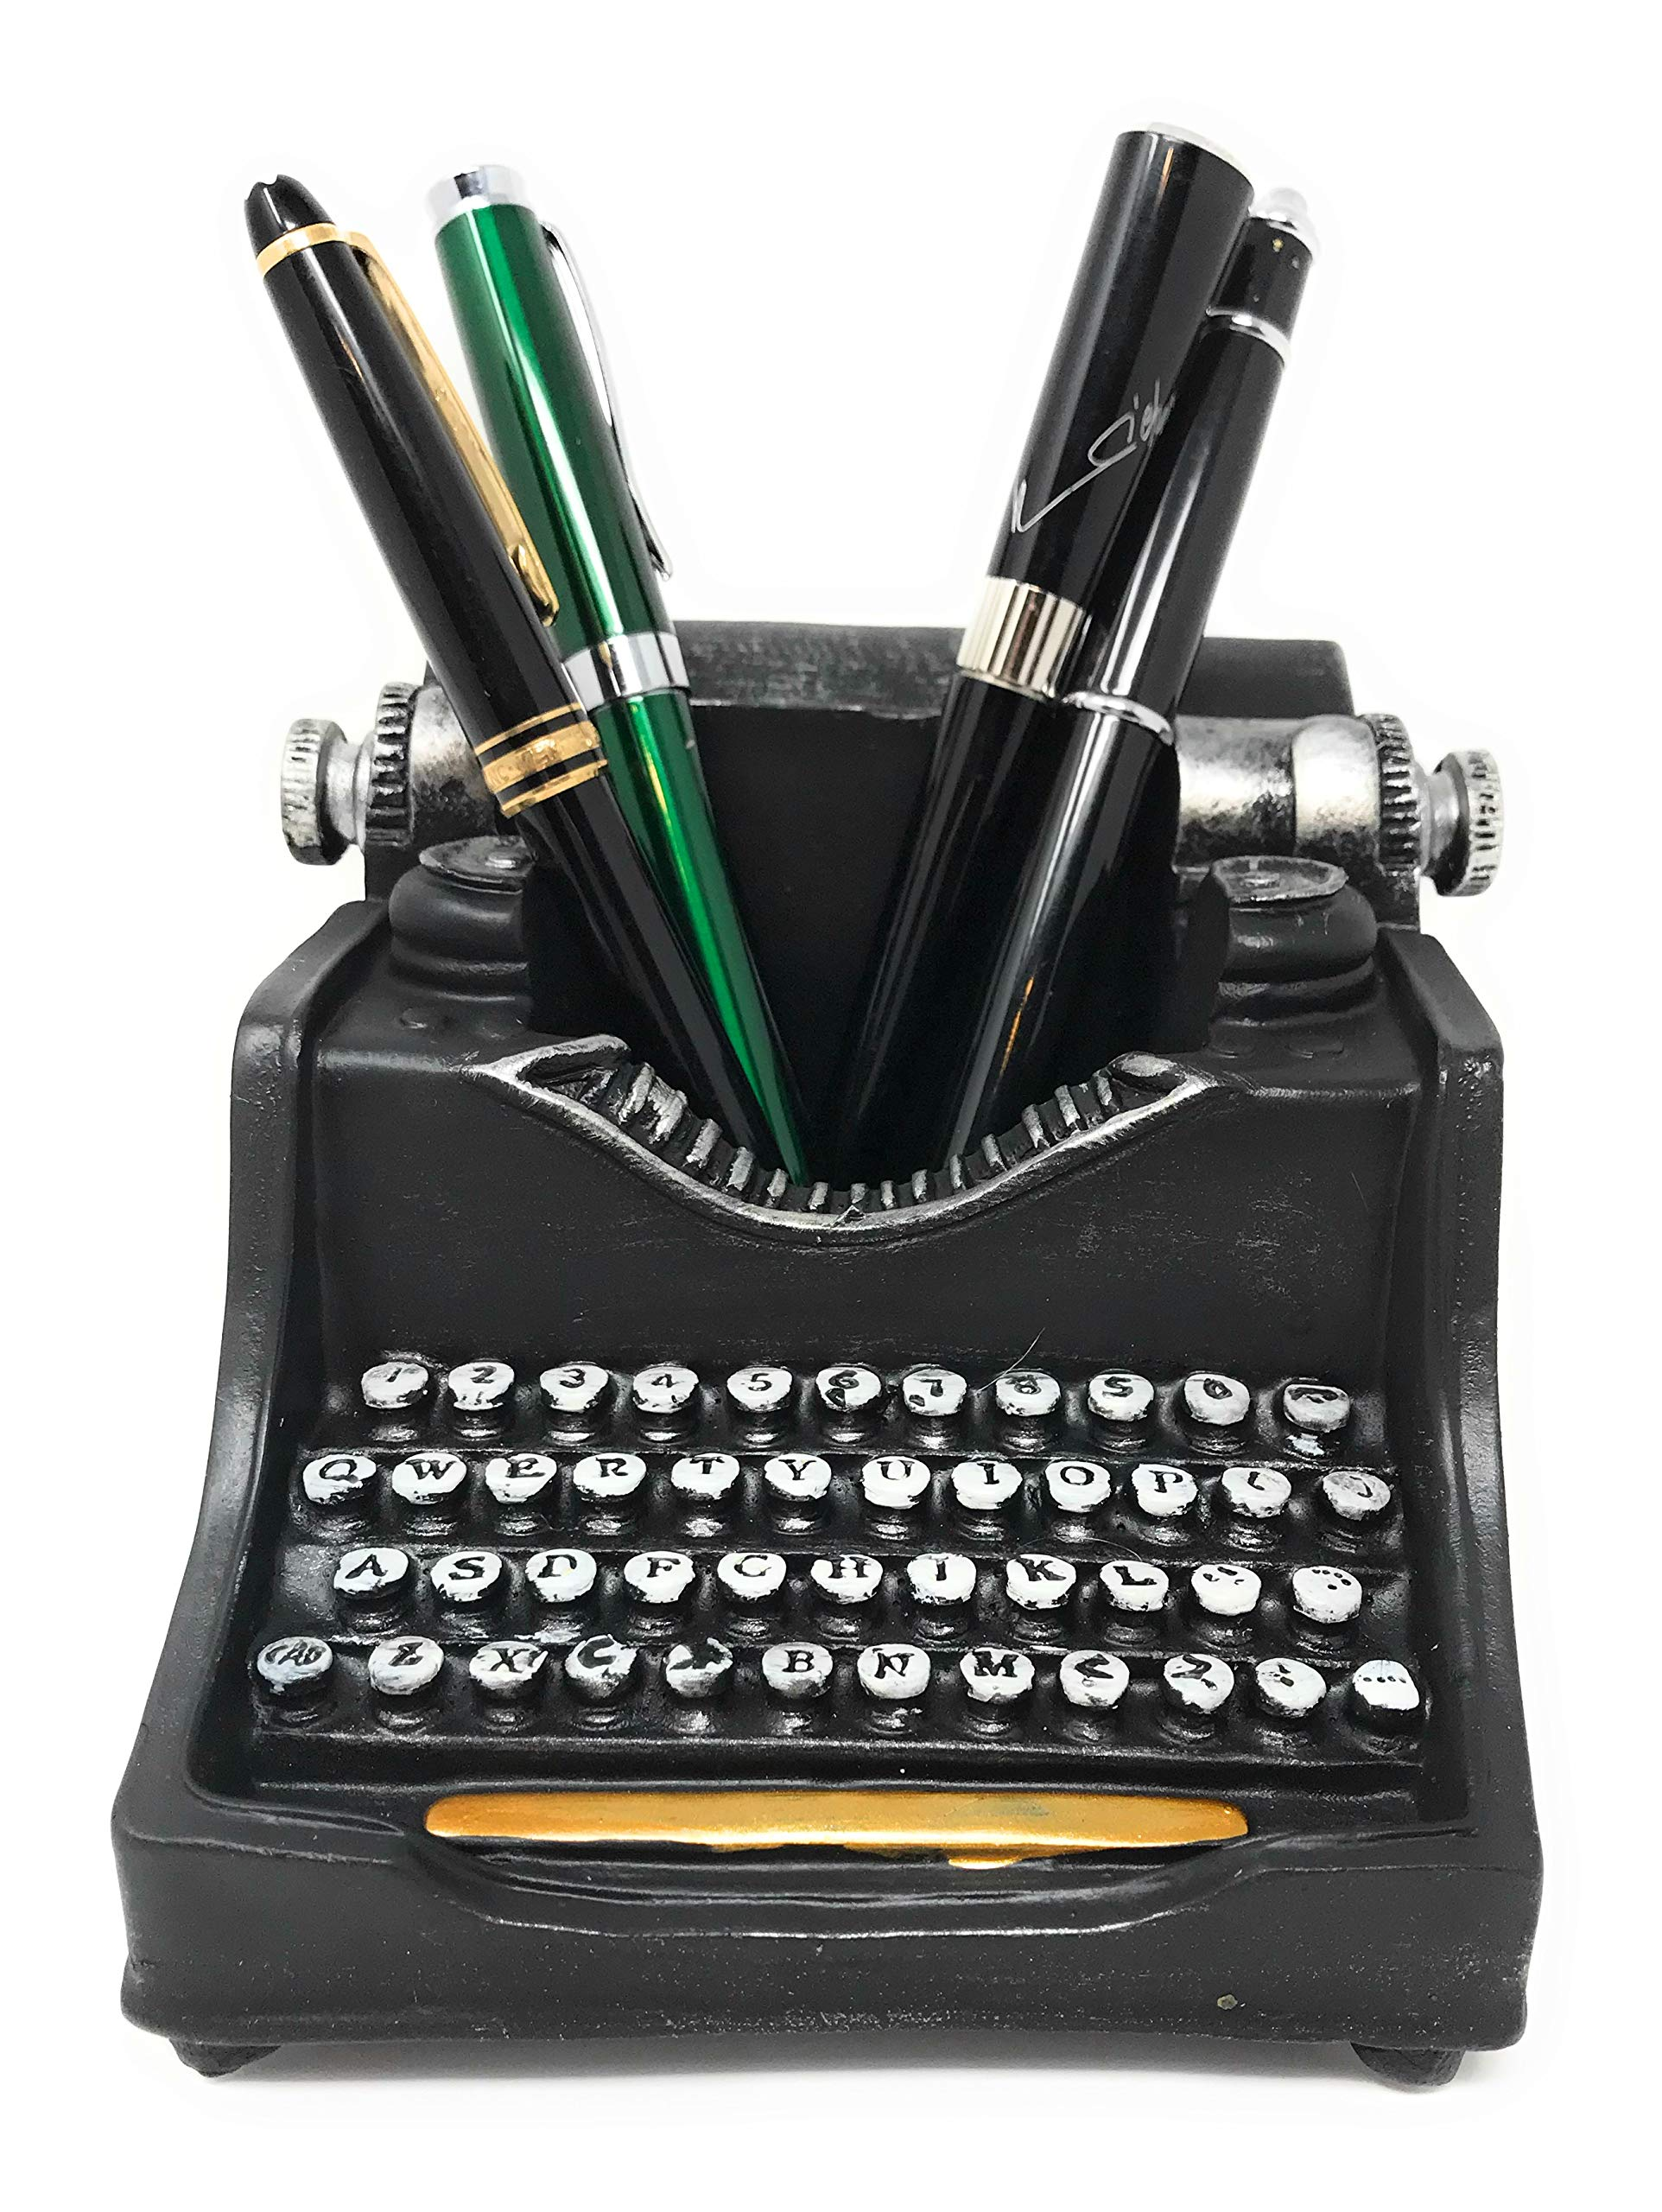 Retro/Shabby Chic/Vintage Pencil Holder for Desk/Desk Organizer for Writer's Desk (Typewriter) by C & C